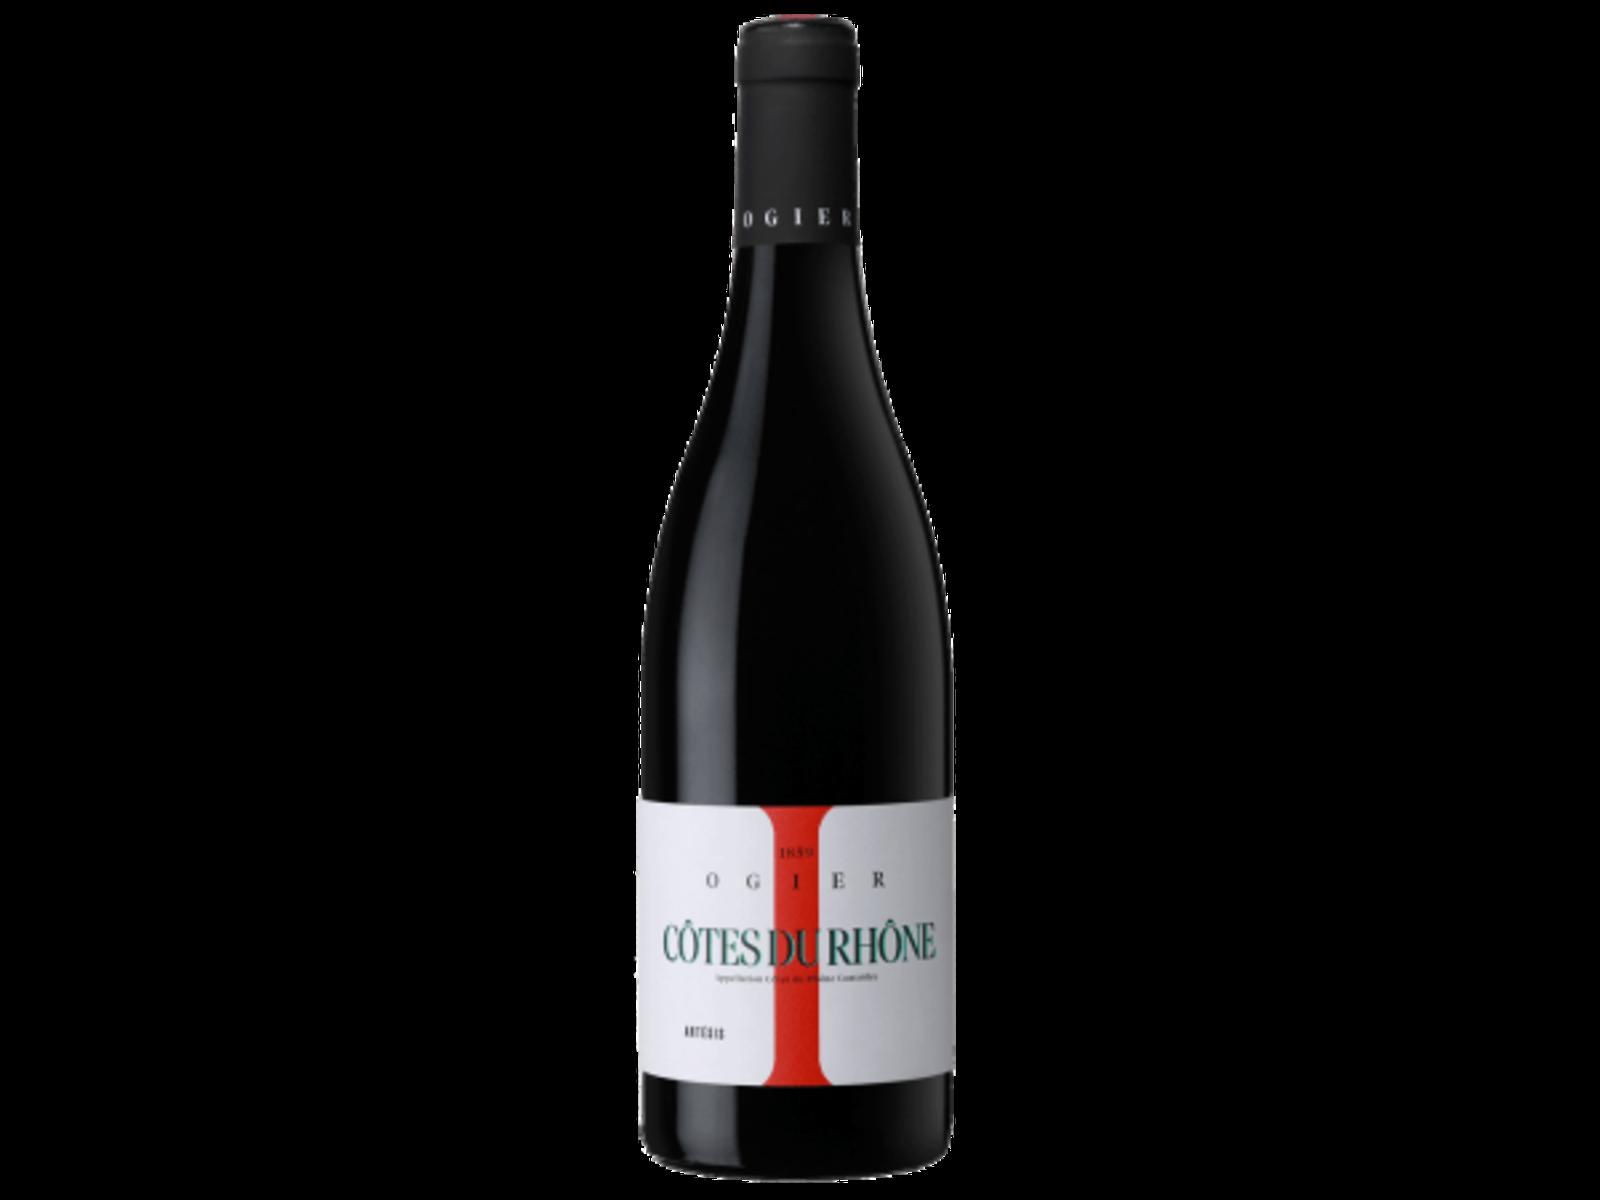 Ogier Artesis / Côtes Du Rhone / Rouge